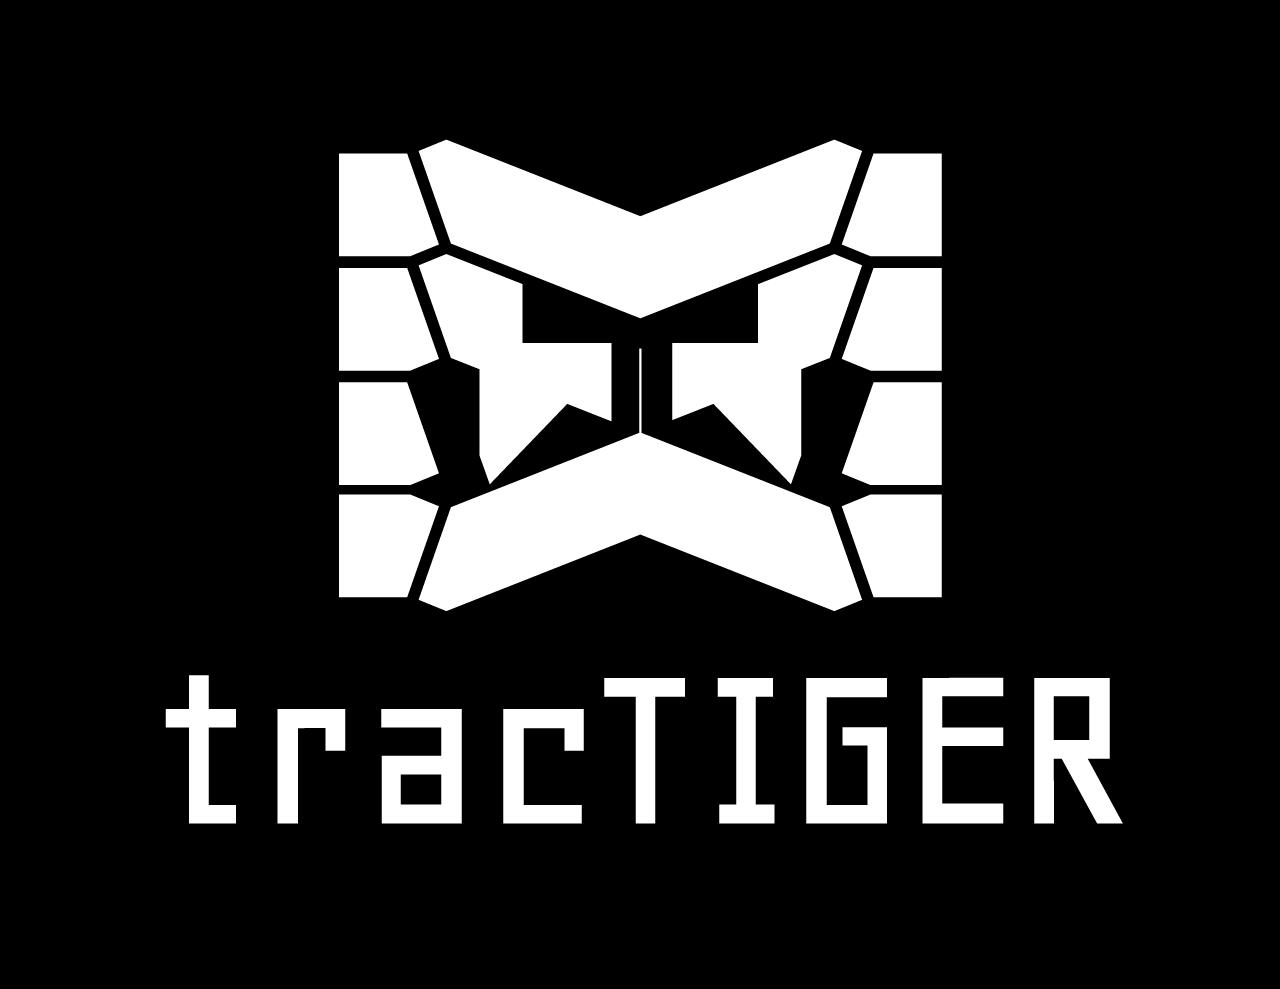 tracTIGER Logo Concept - White on Black